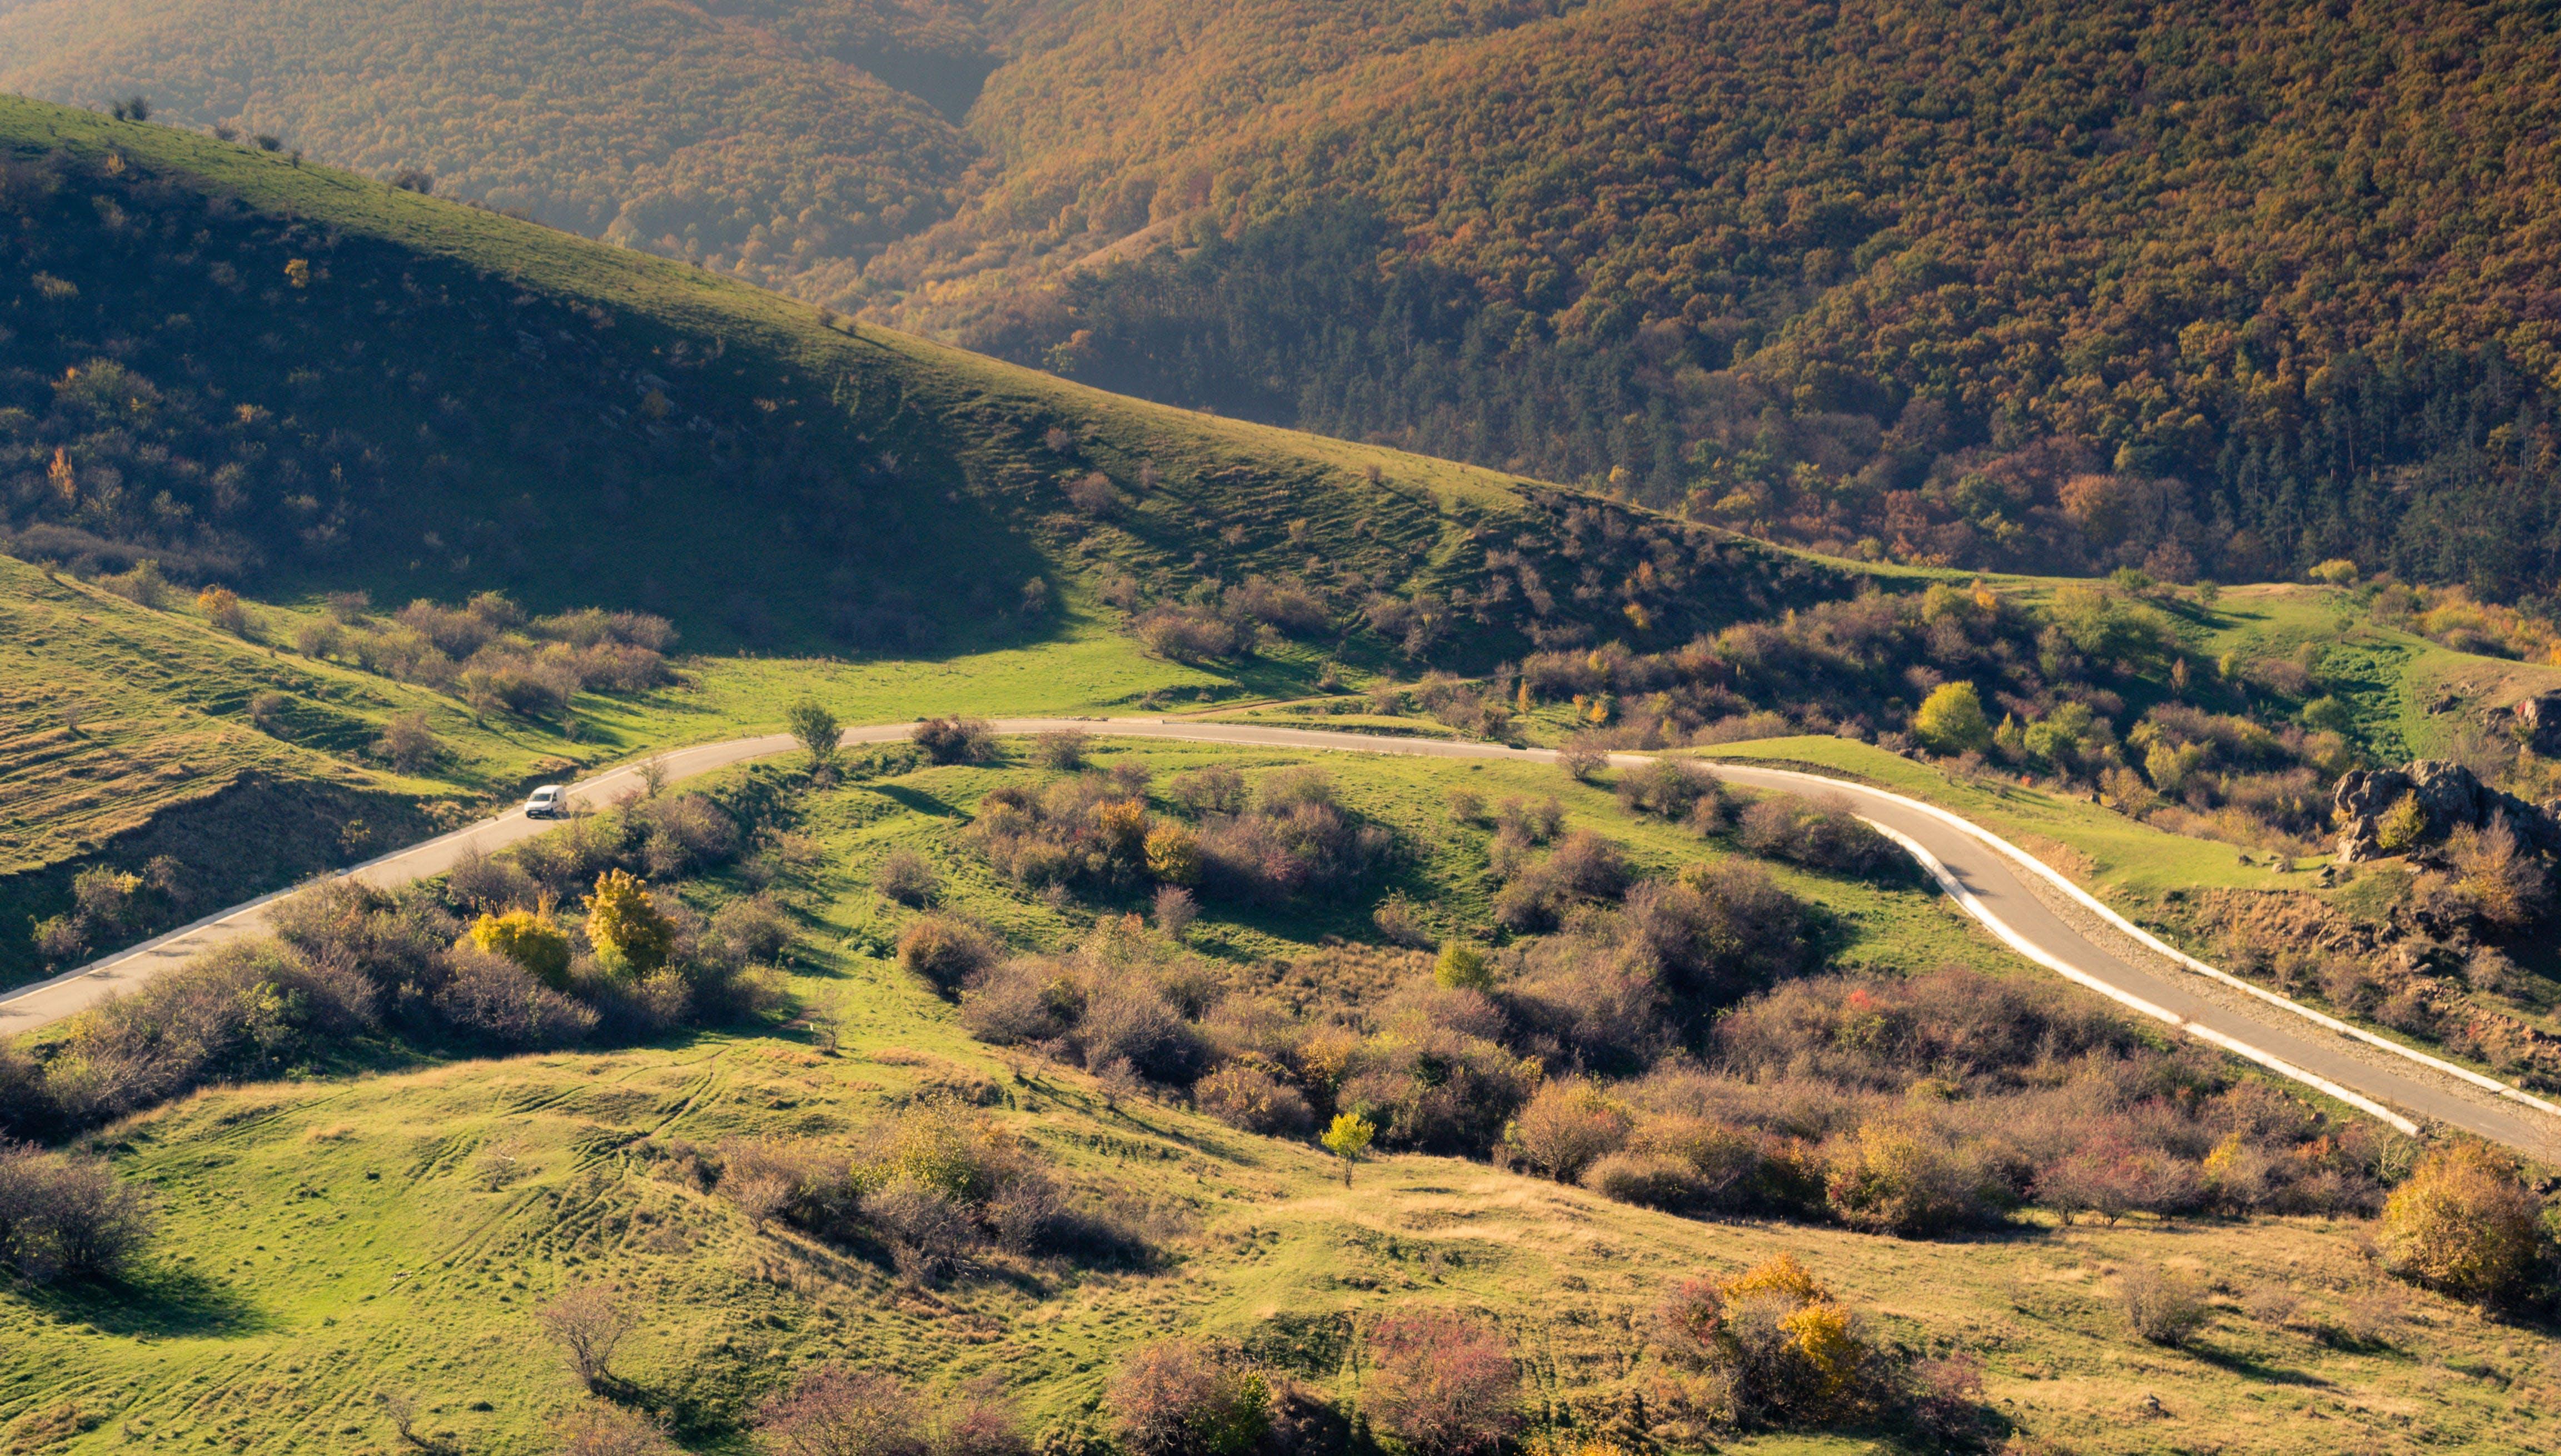 Free stock photo of landscape, mountains, autumn, travel